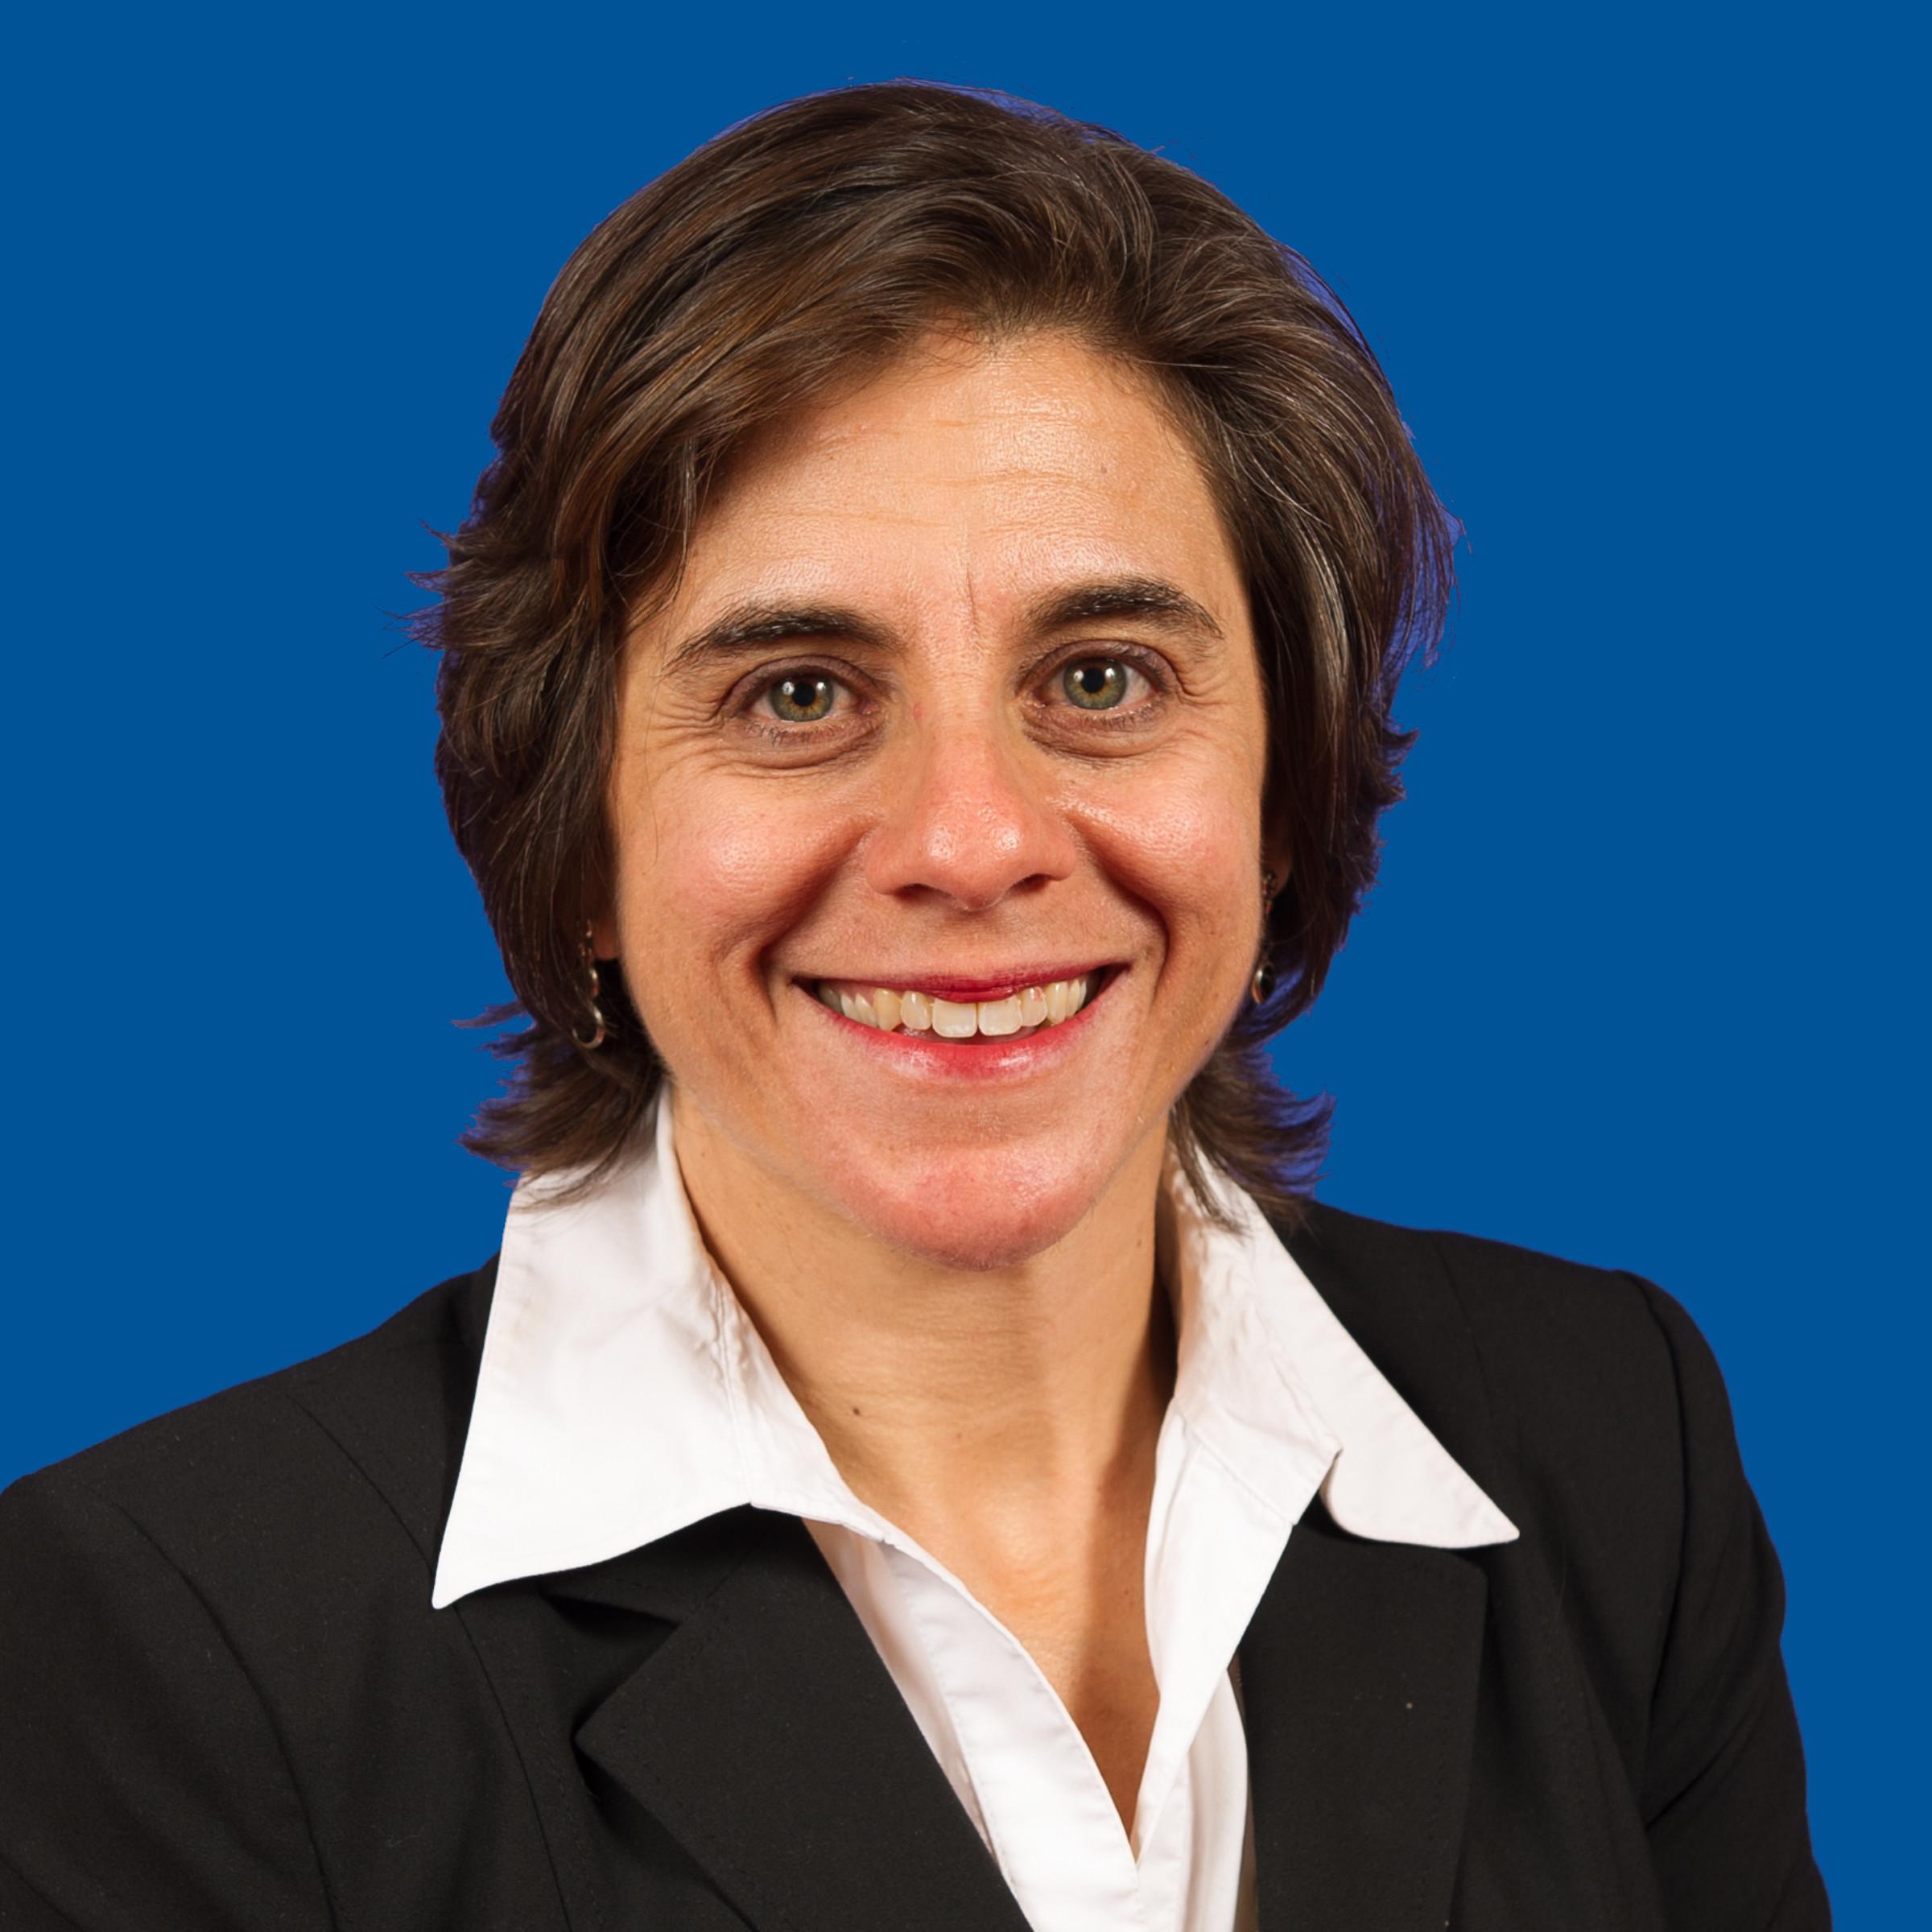 Julie Coffman